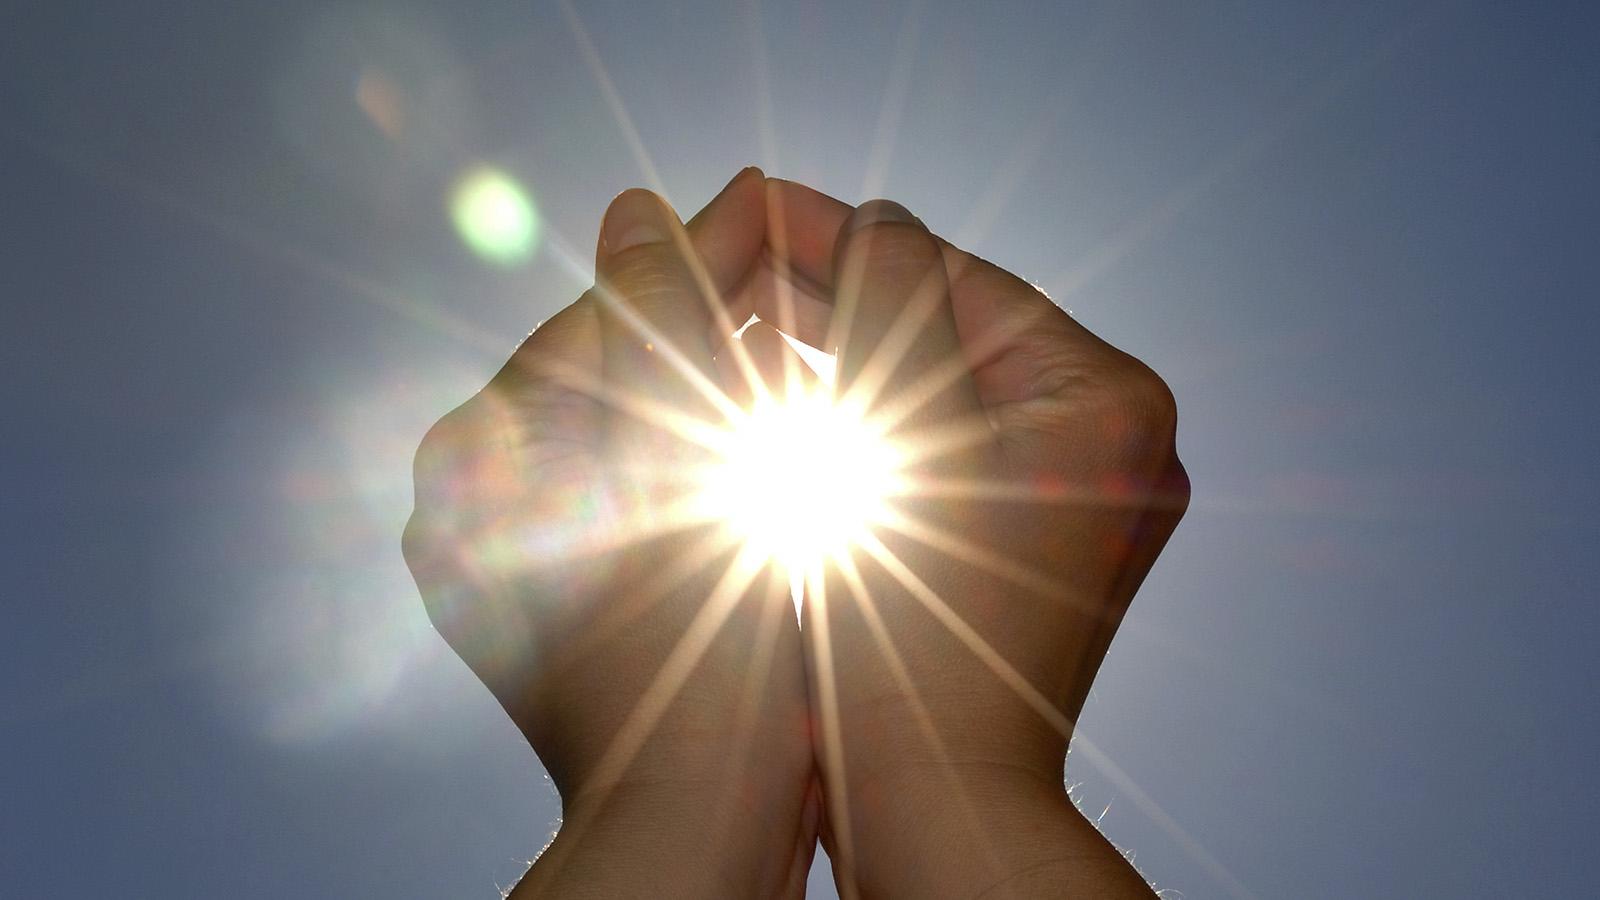 Влияние солнечного света на организм человека